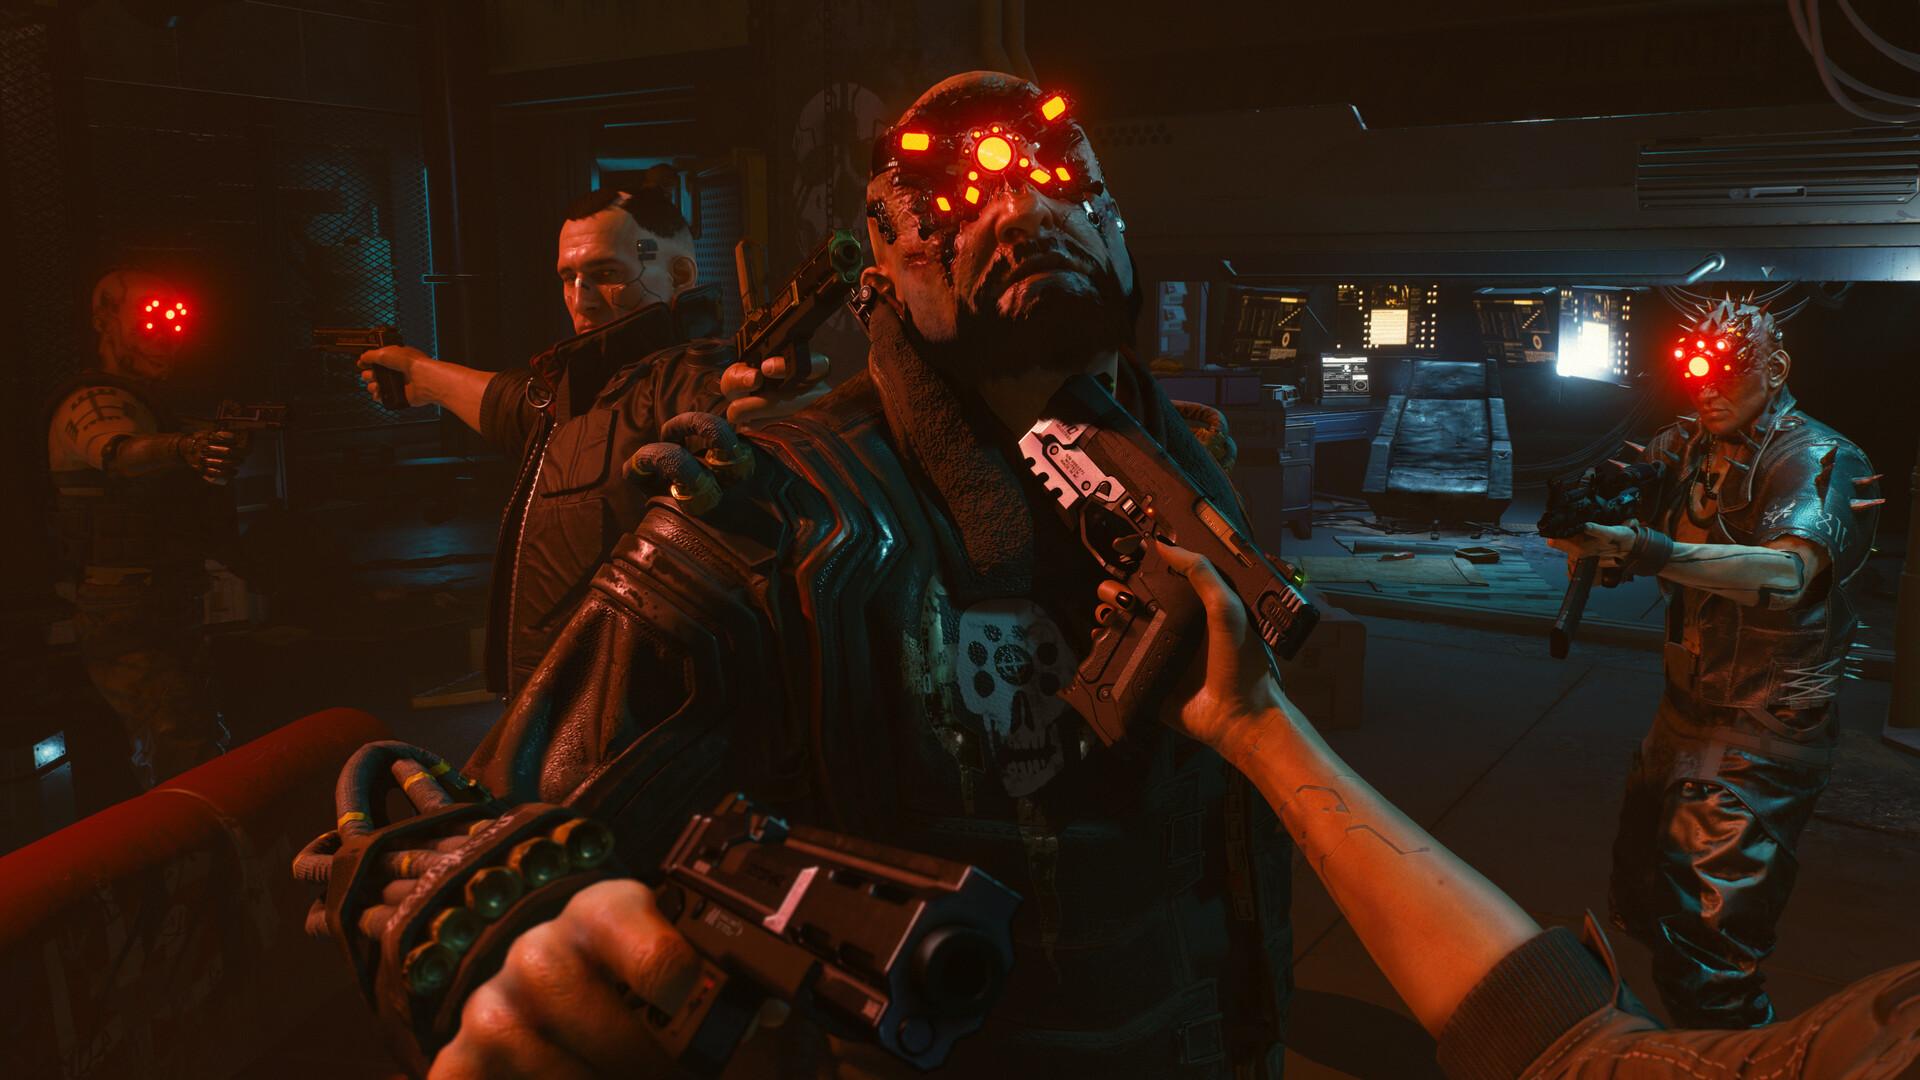 Cyberpunk 2077 on Steam